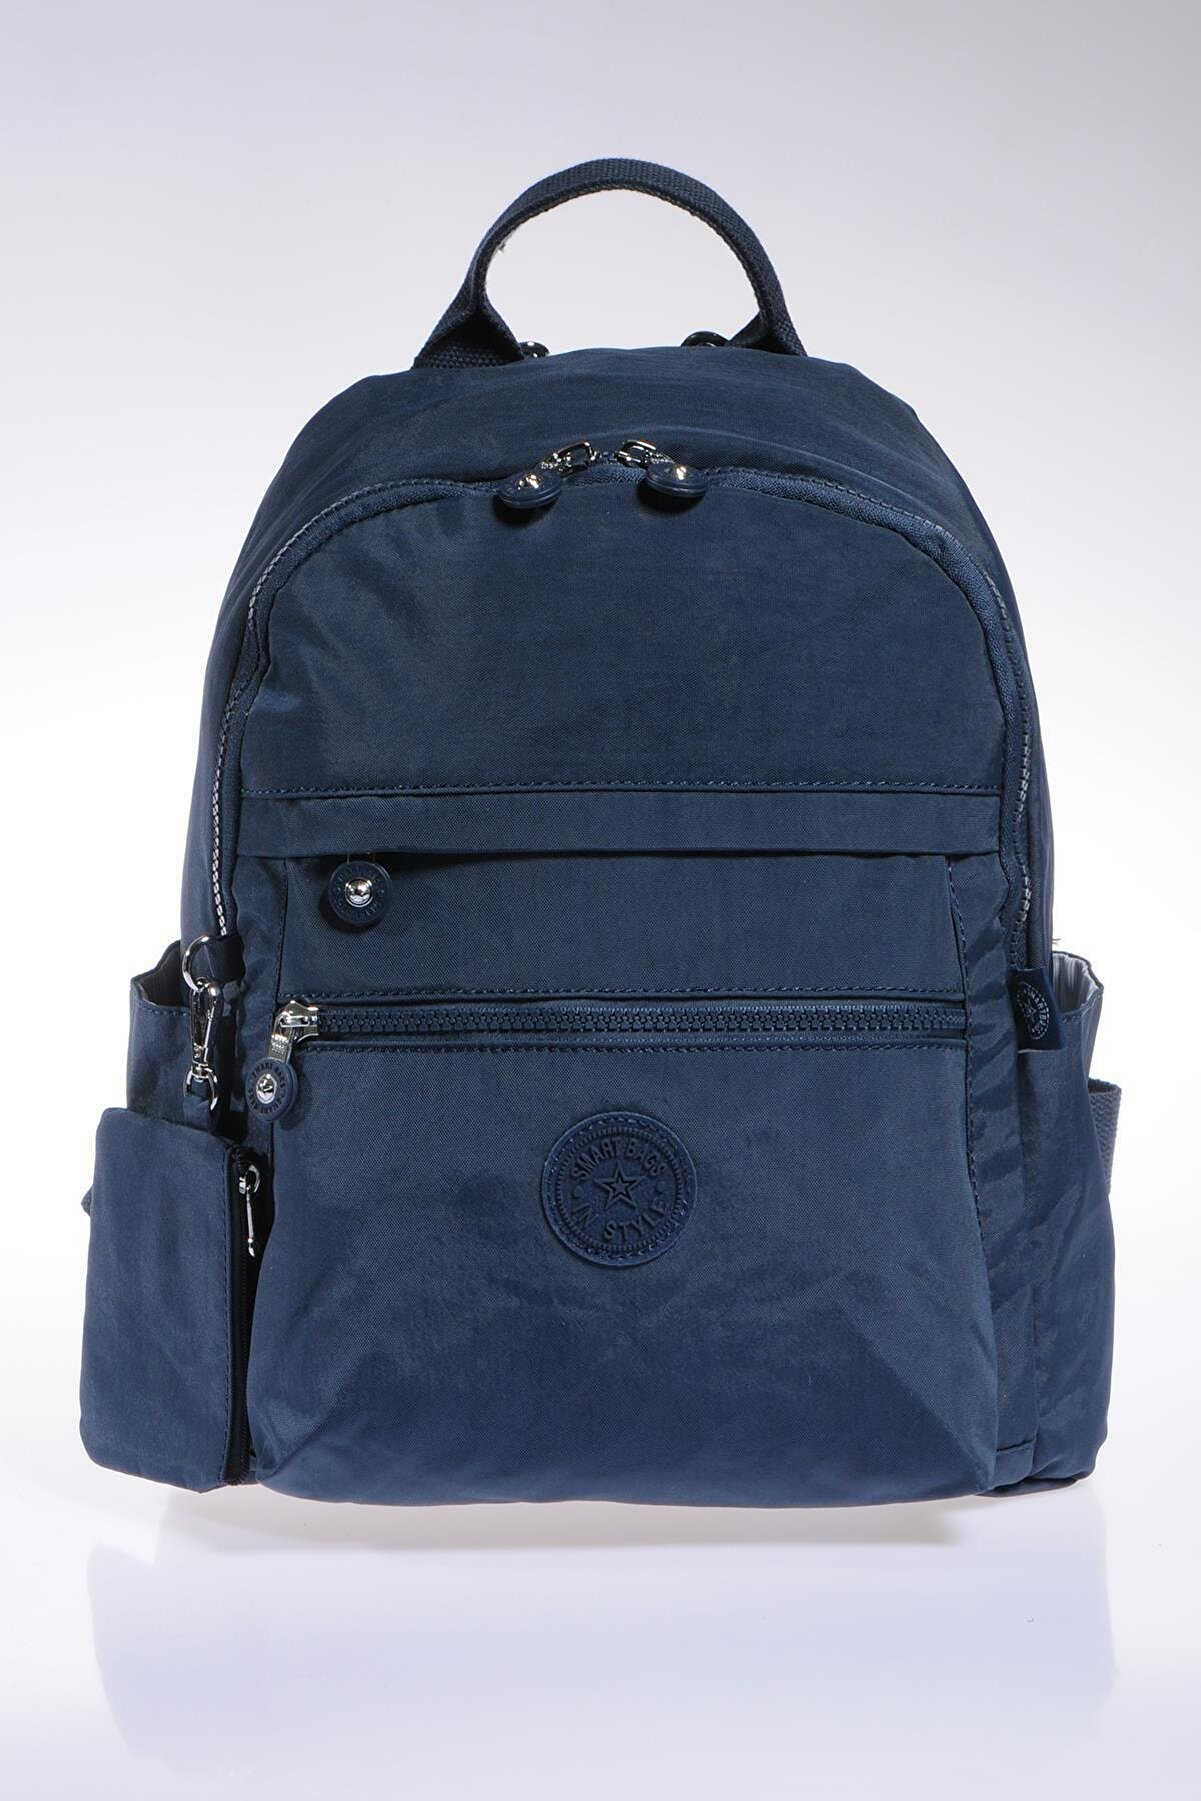 Smart Bags Smb1234-0033 Lacivert Kadın Sırt Çantası